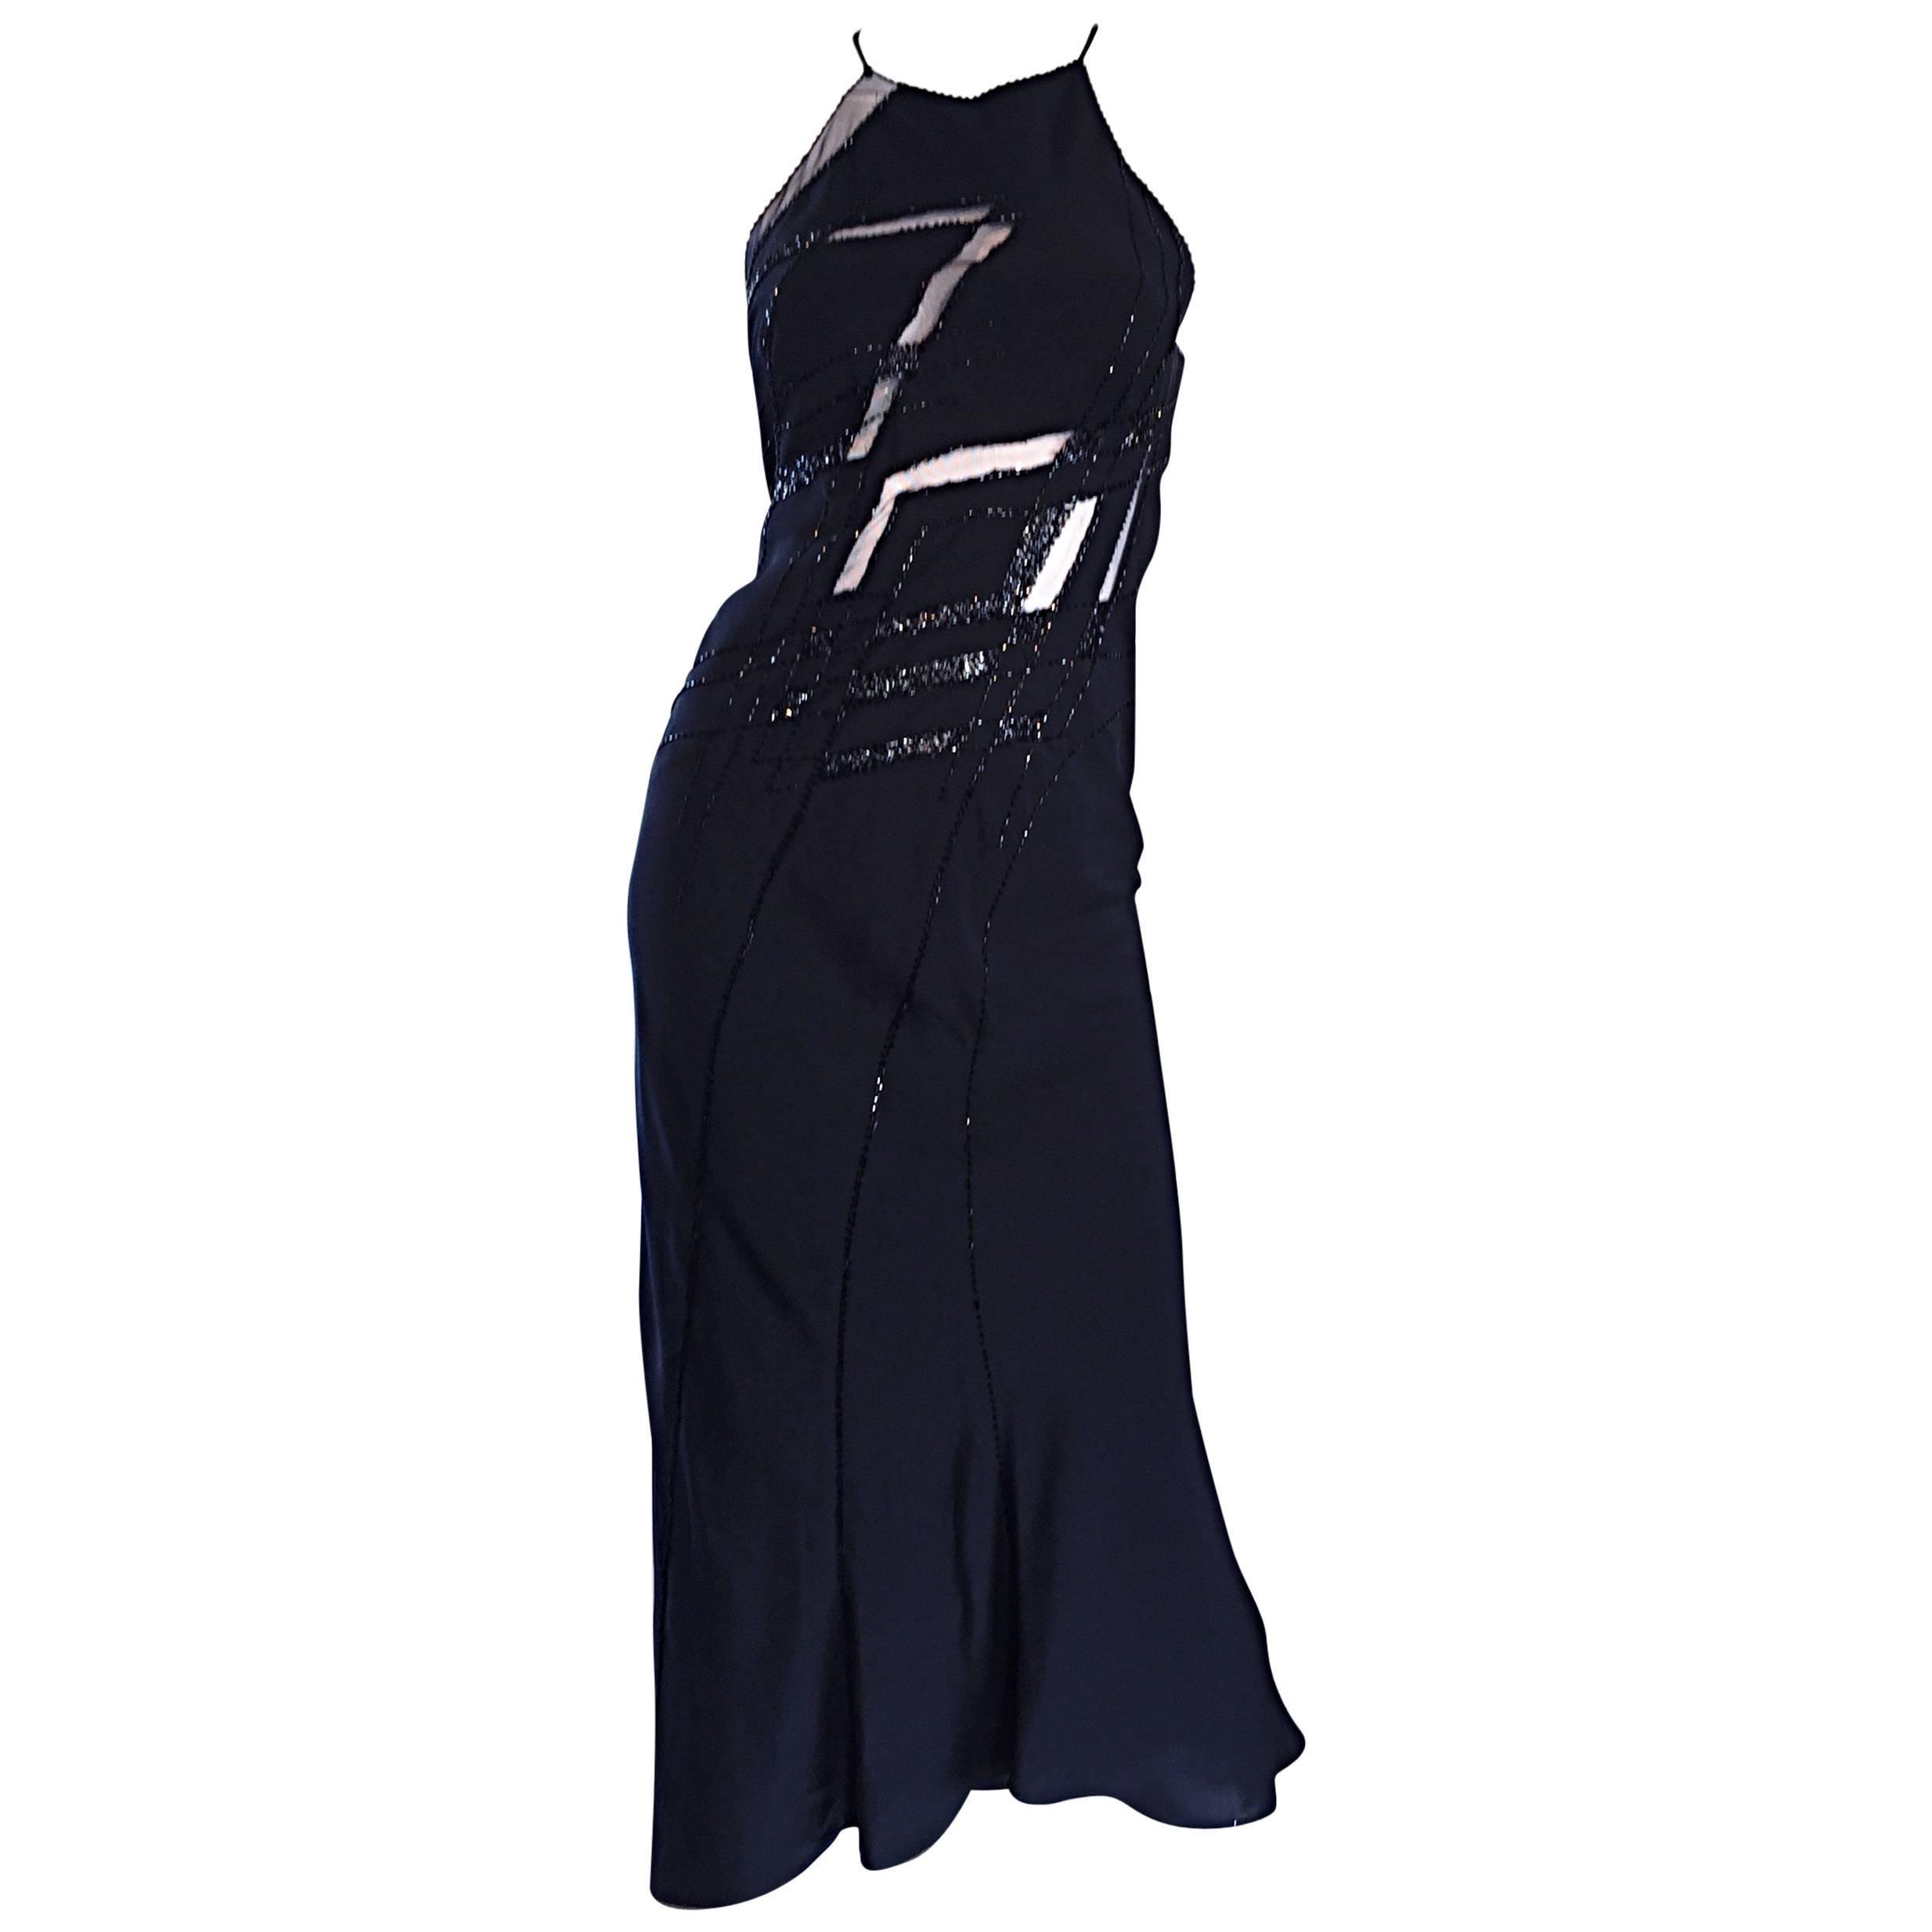 Beautiful Vintage Lillie Rubin Size 8 Cut Out Beaded Handkerchief Dress Size 8